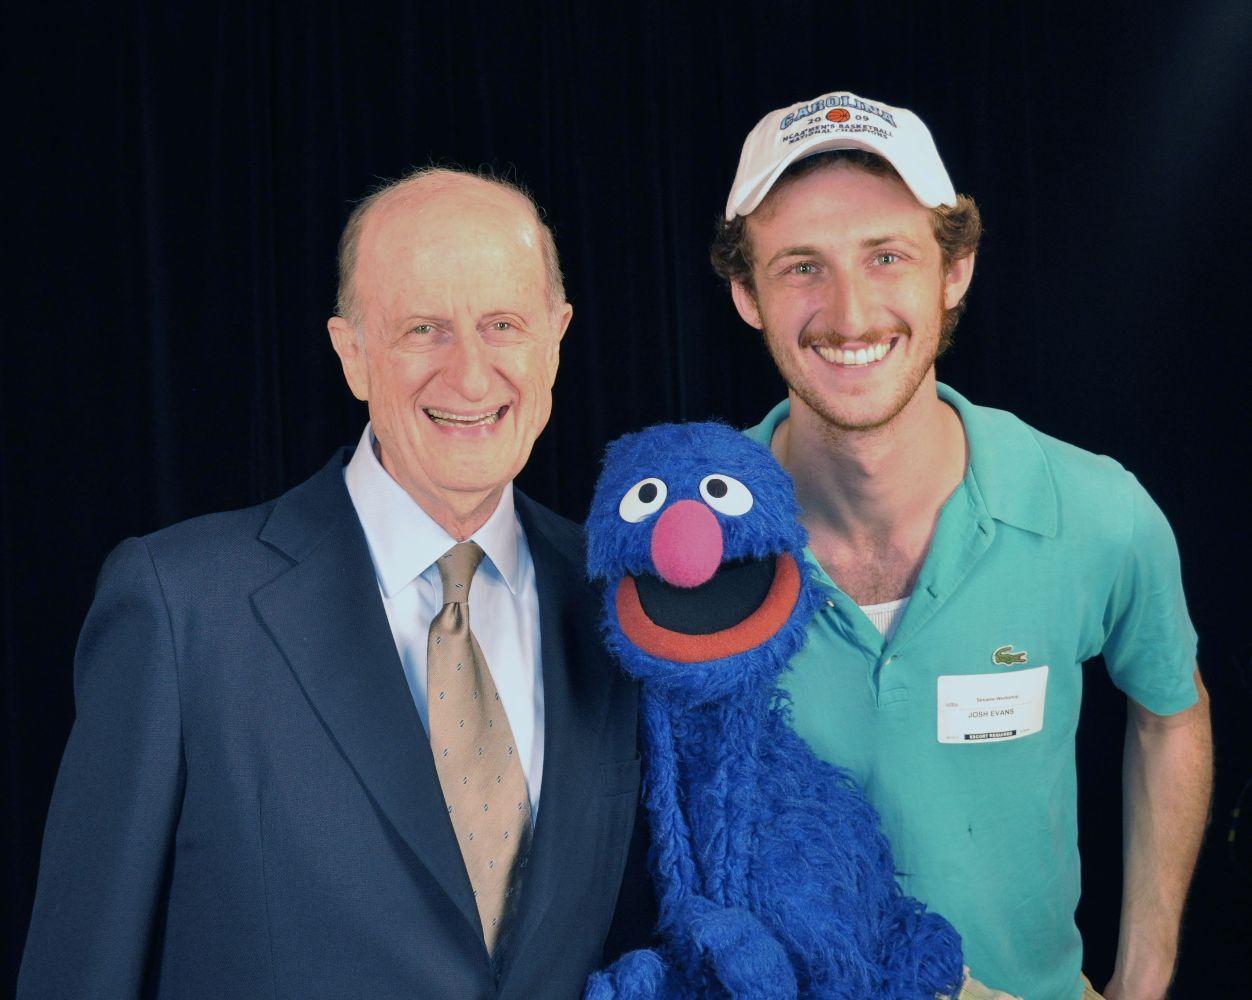 Eli N. Evans, Grover and Josh Evans